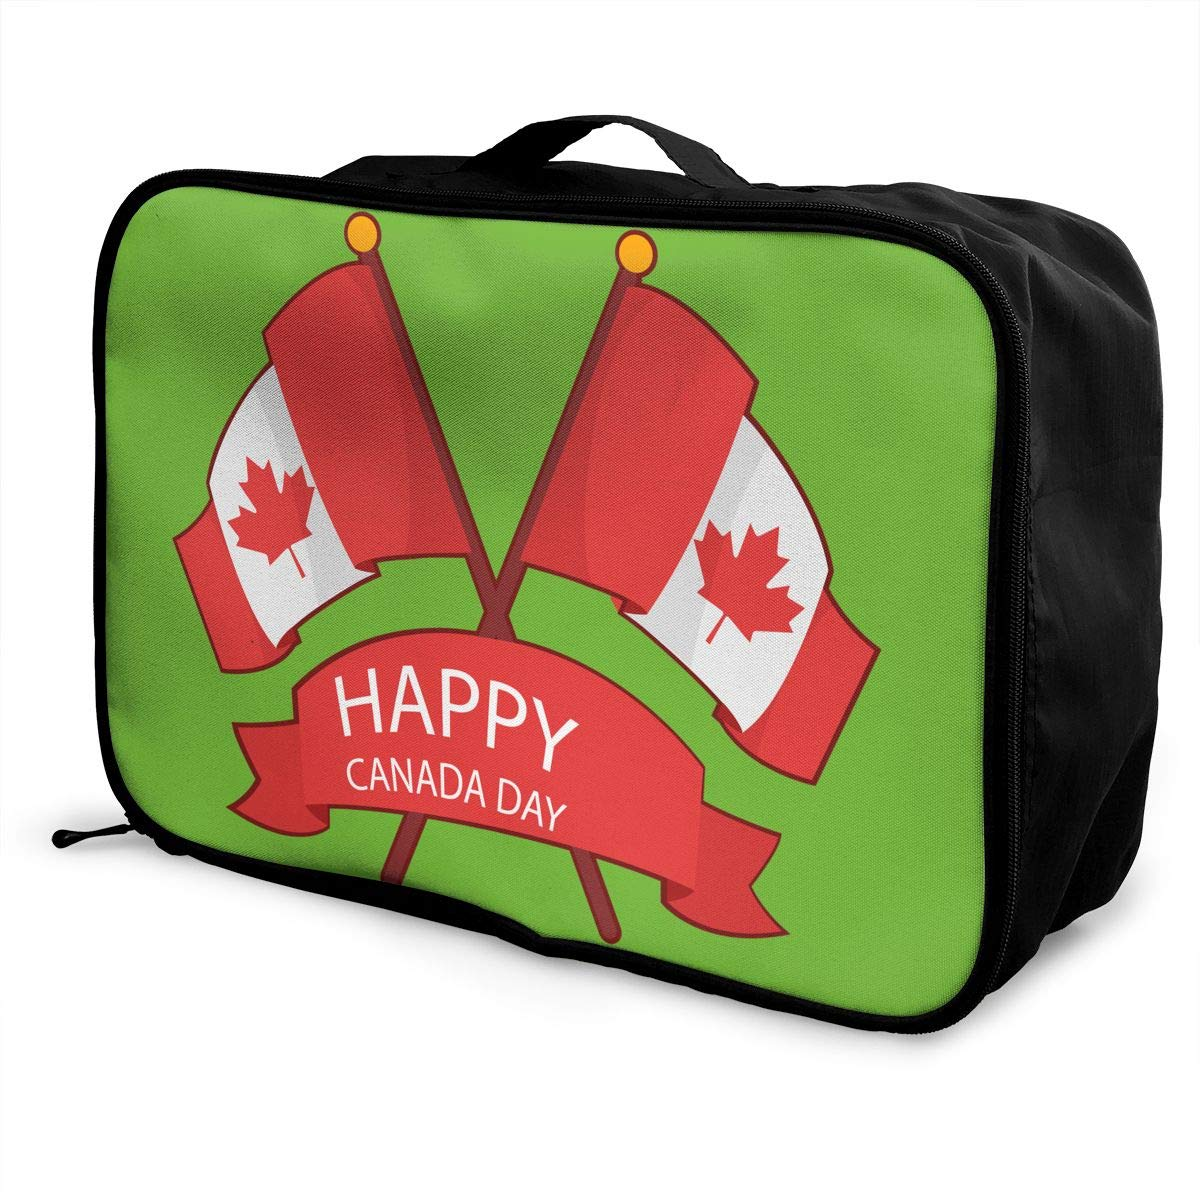 Travel Luggage Duffle Bag Lightweight Portable Handbag Canada Day Large Capacity Waterproof Foldable Storage Tote